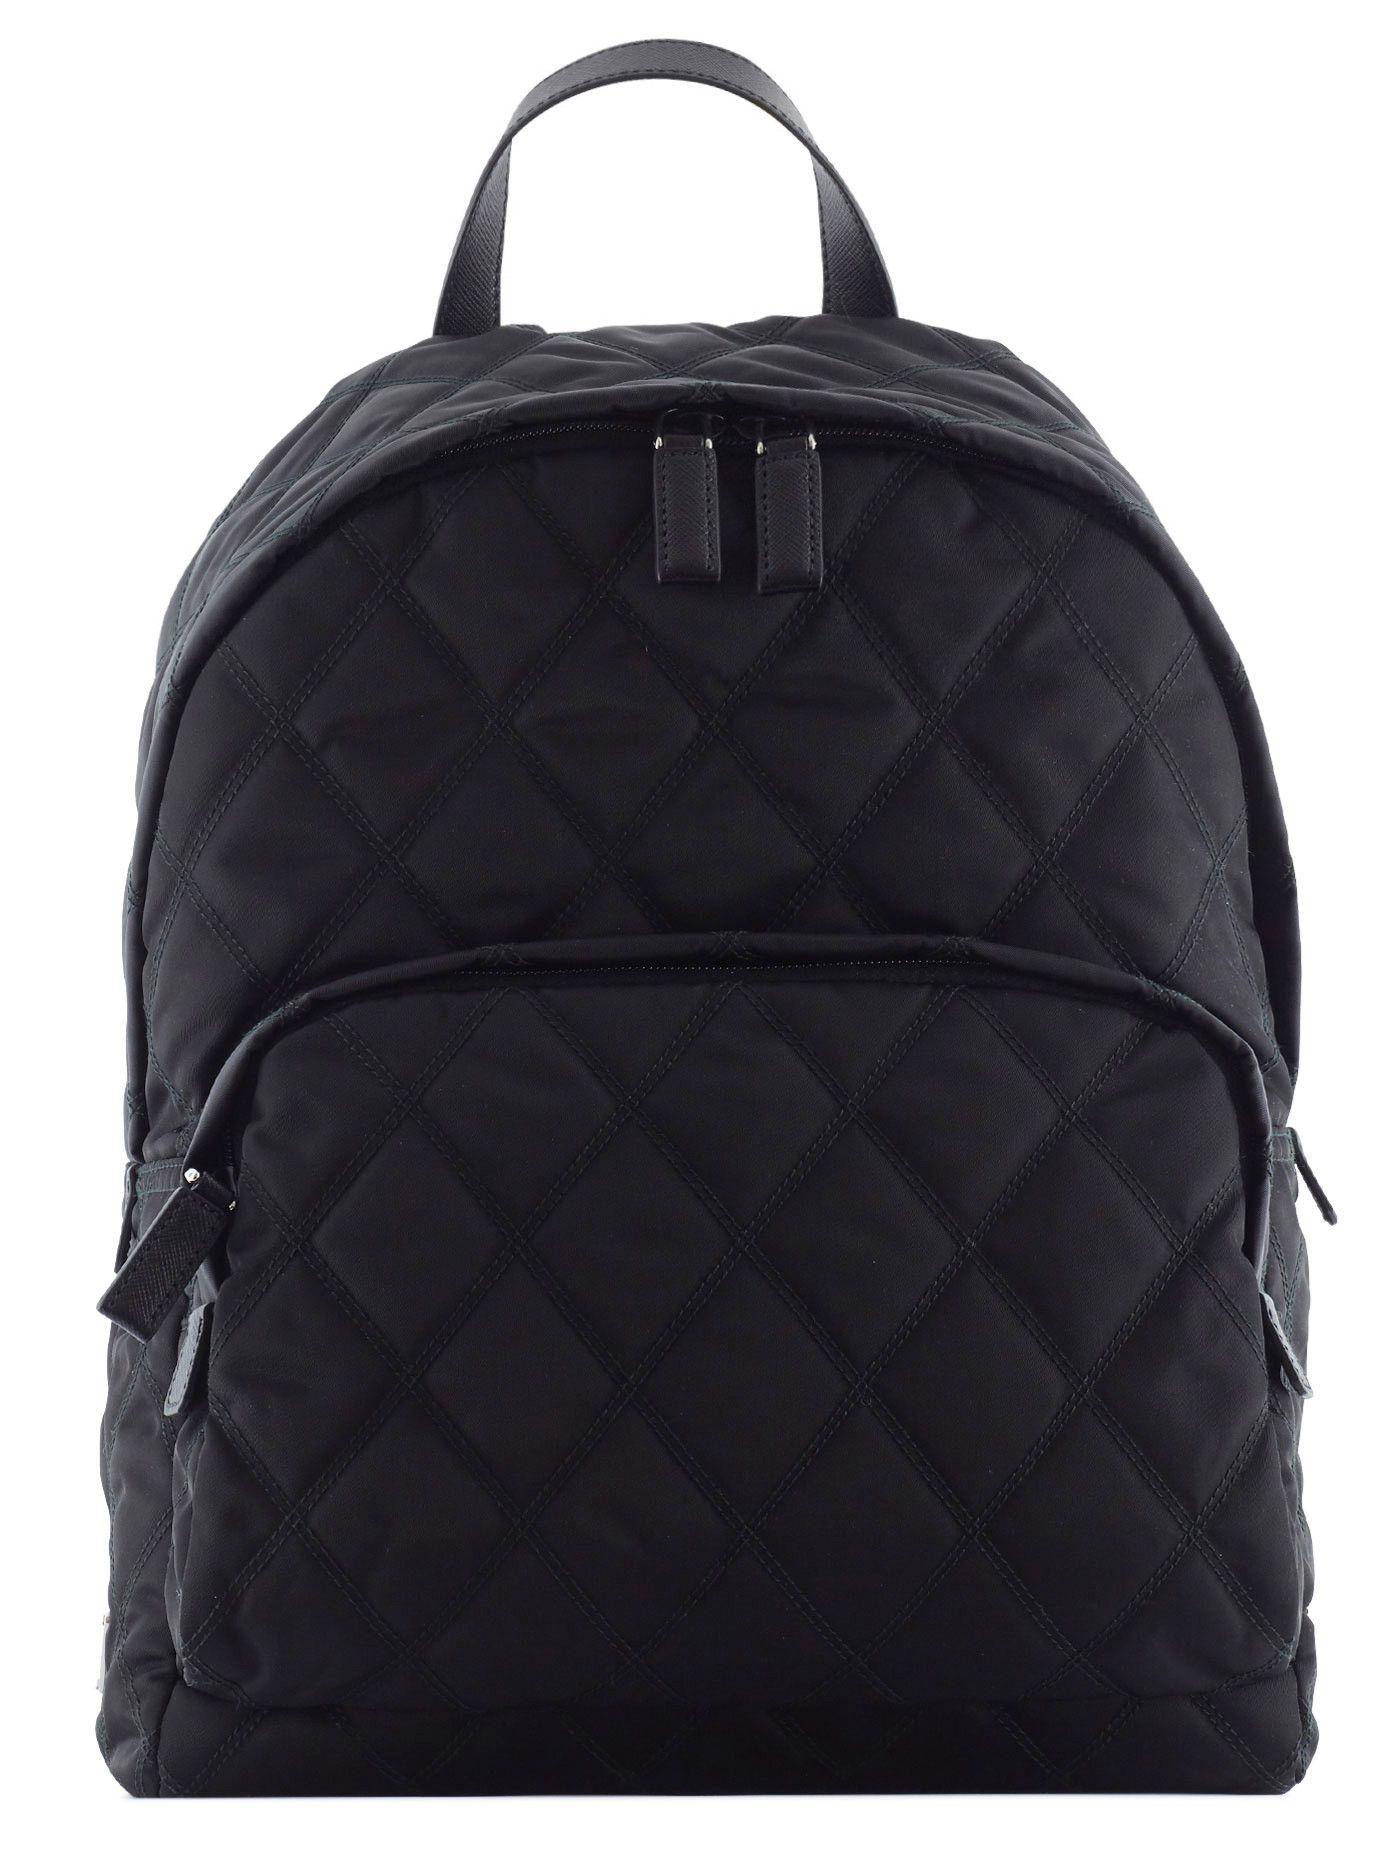 60ba43bd5619 PRADA BACKPACK | Bags | Prada backpack, Backpacks, Bags